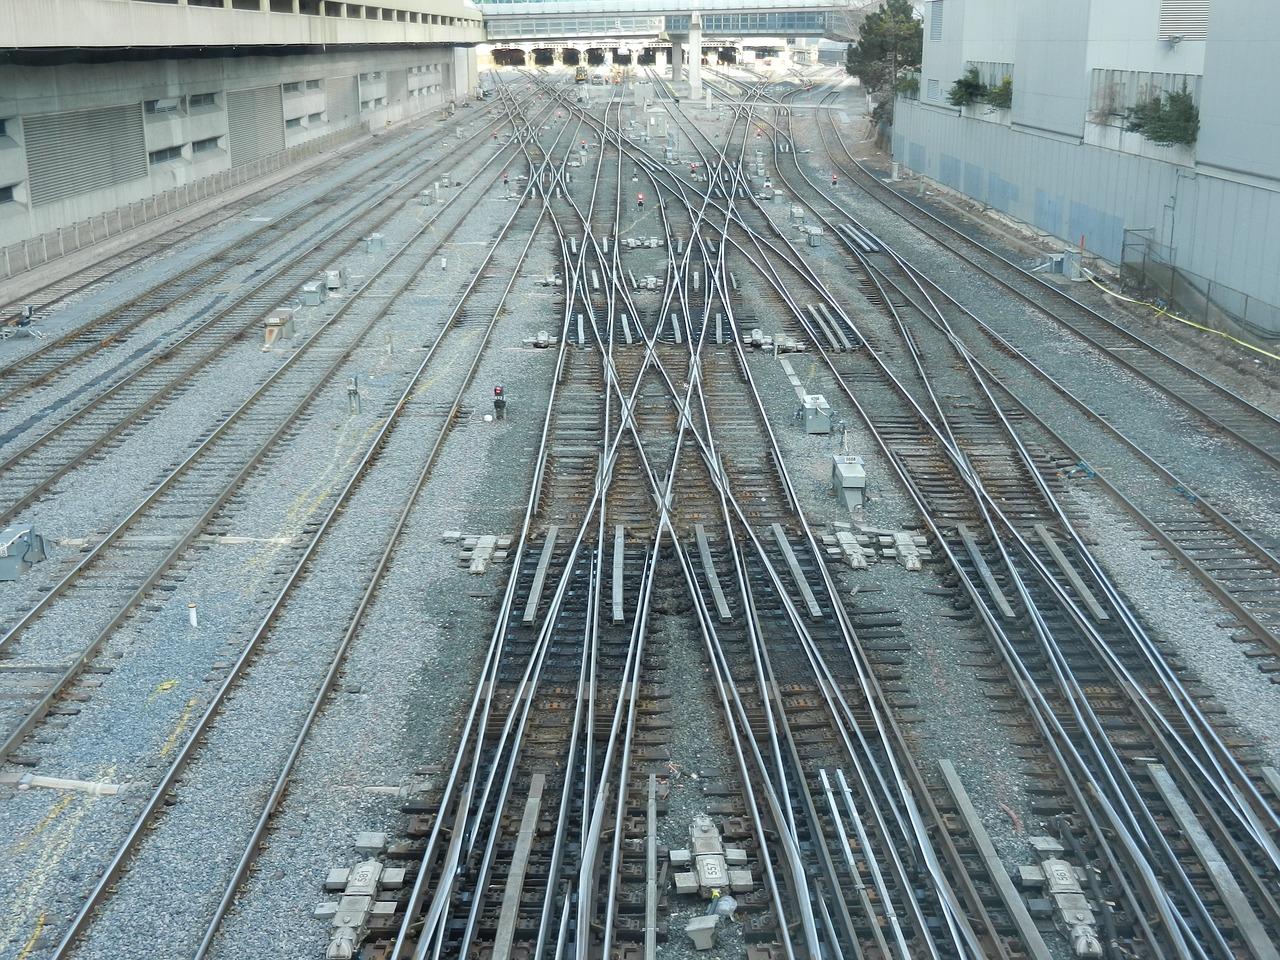 train tracks transportation railroad railway free photo from